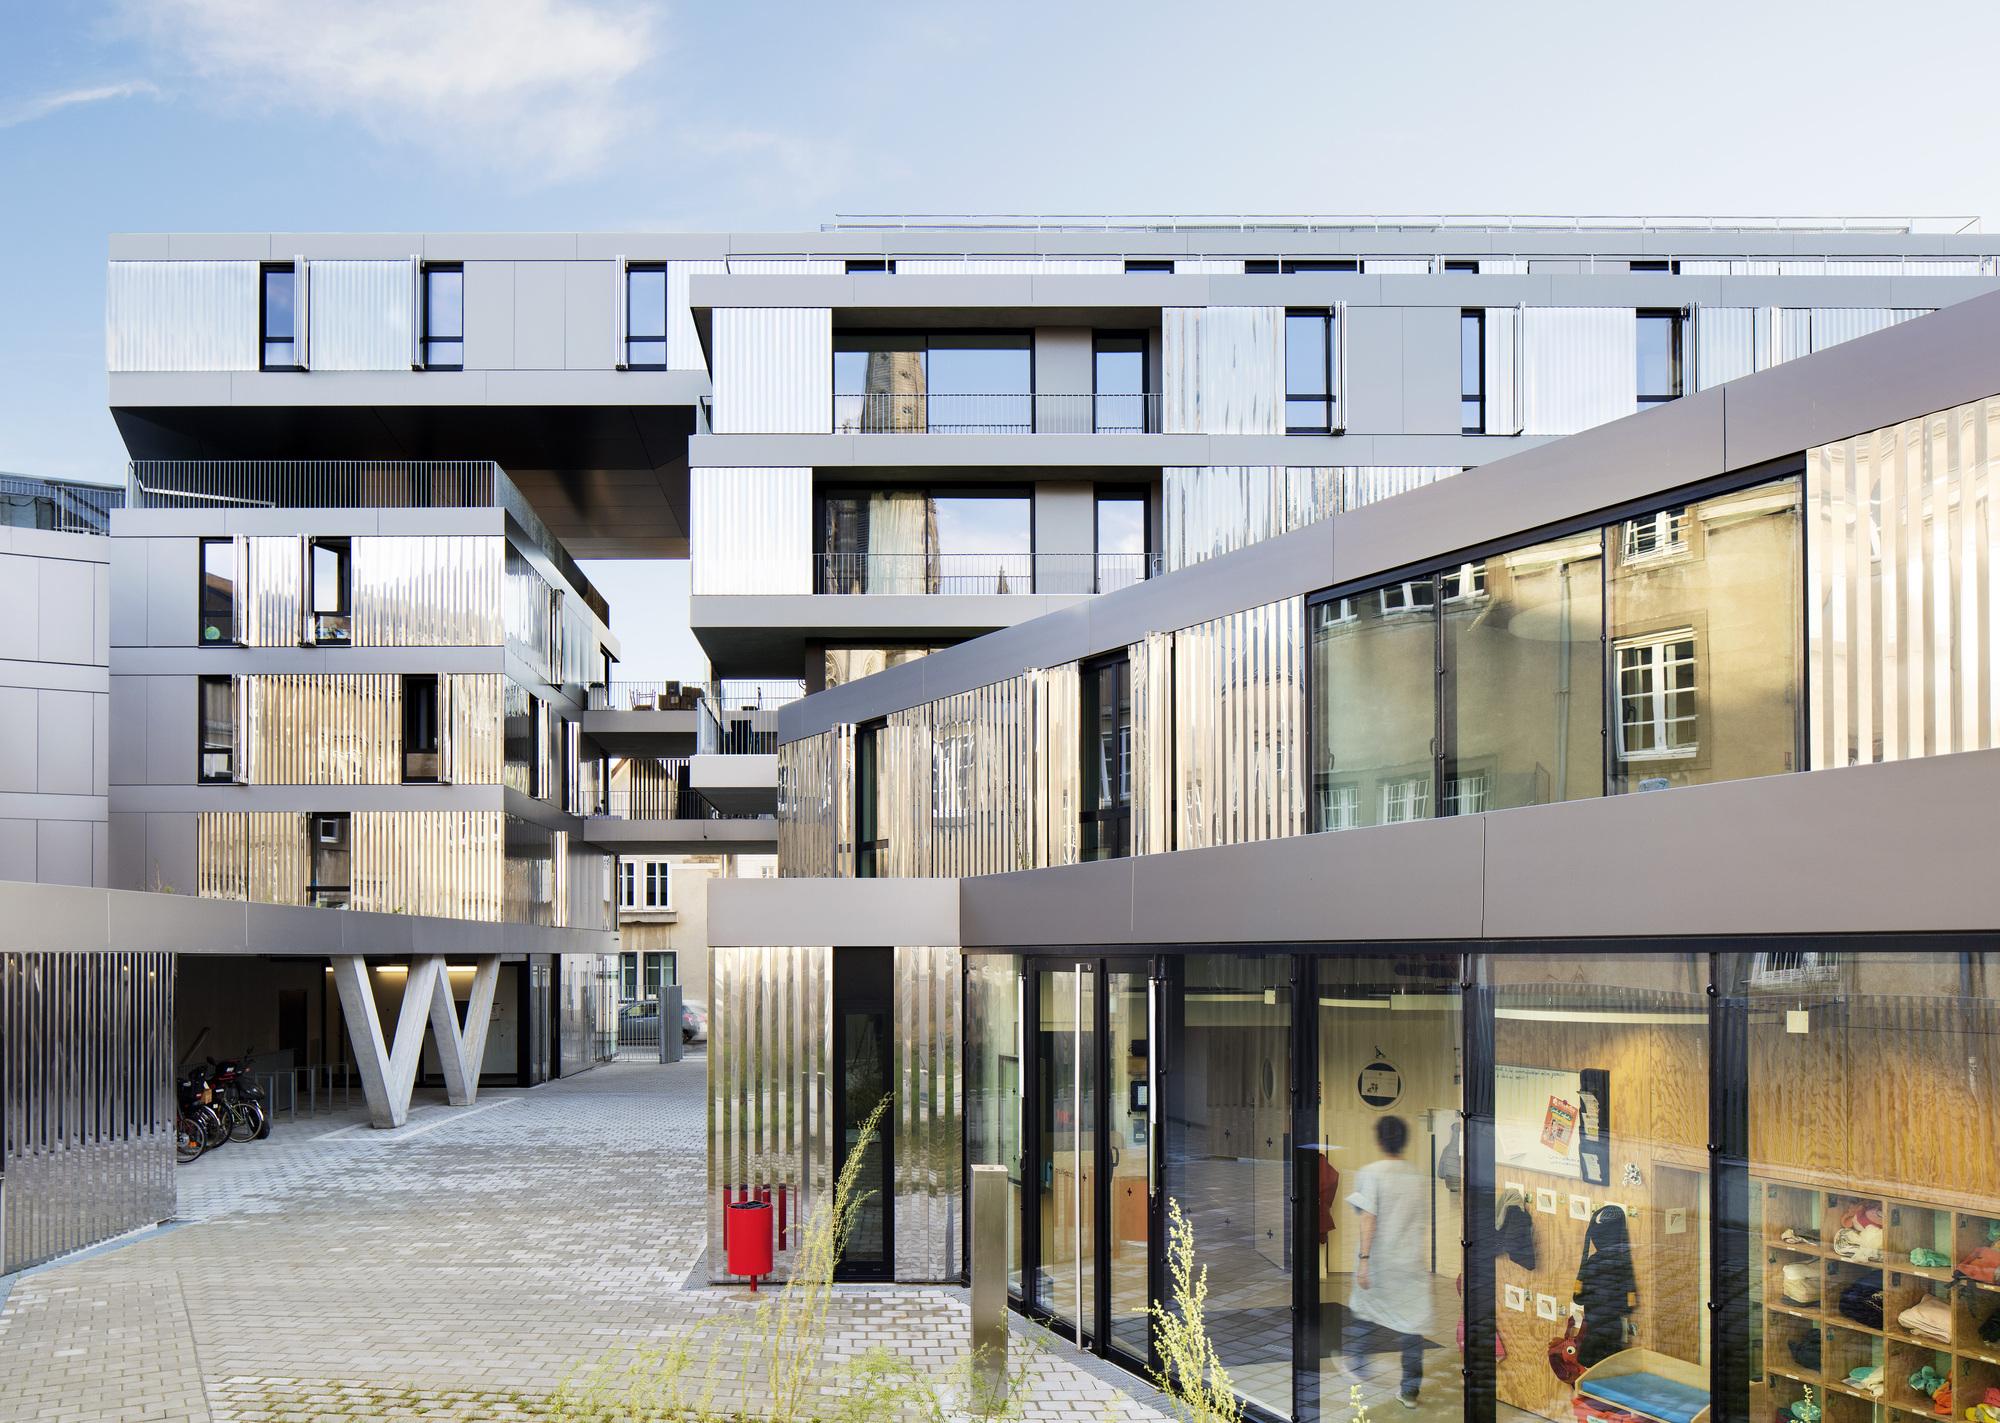 Nantes tag archdaily 56 apartments in nantes phd architectes michel denanc solutioingenieria Choice Image